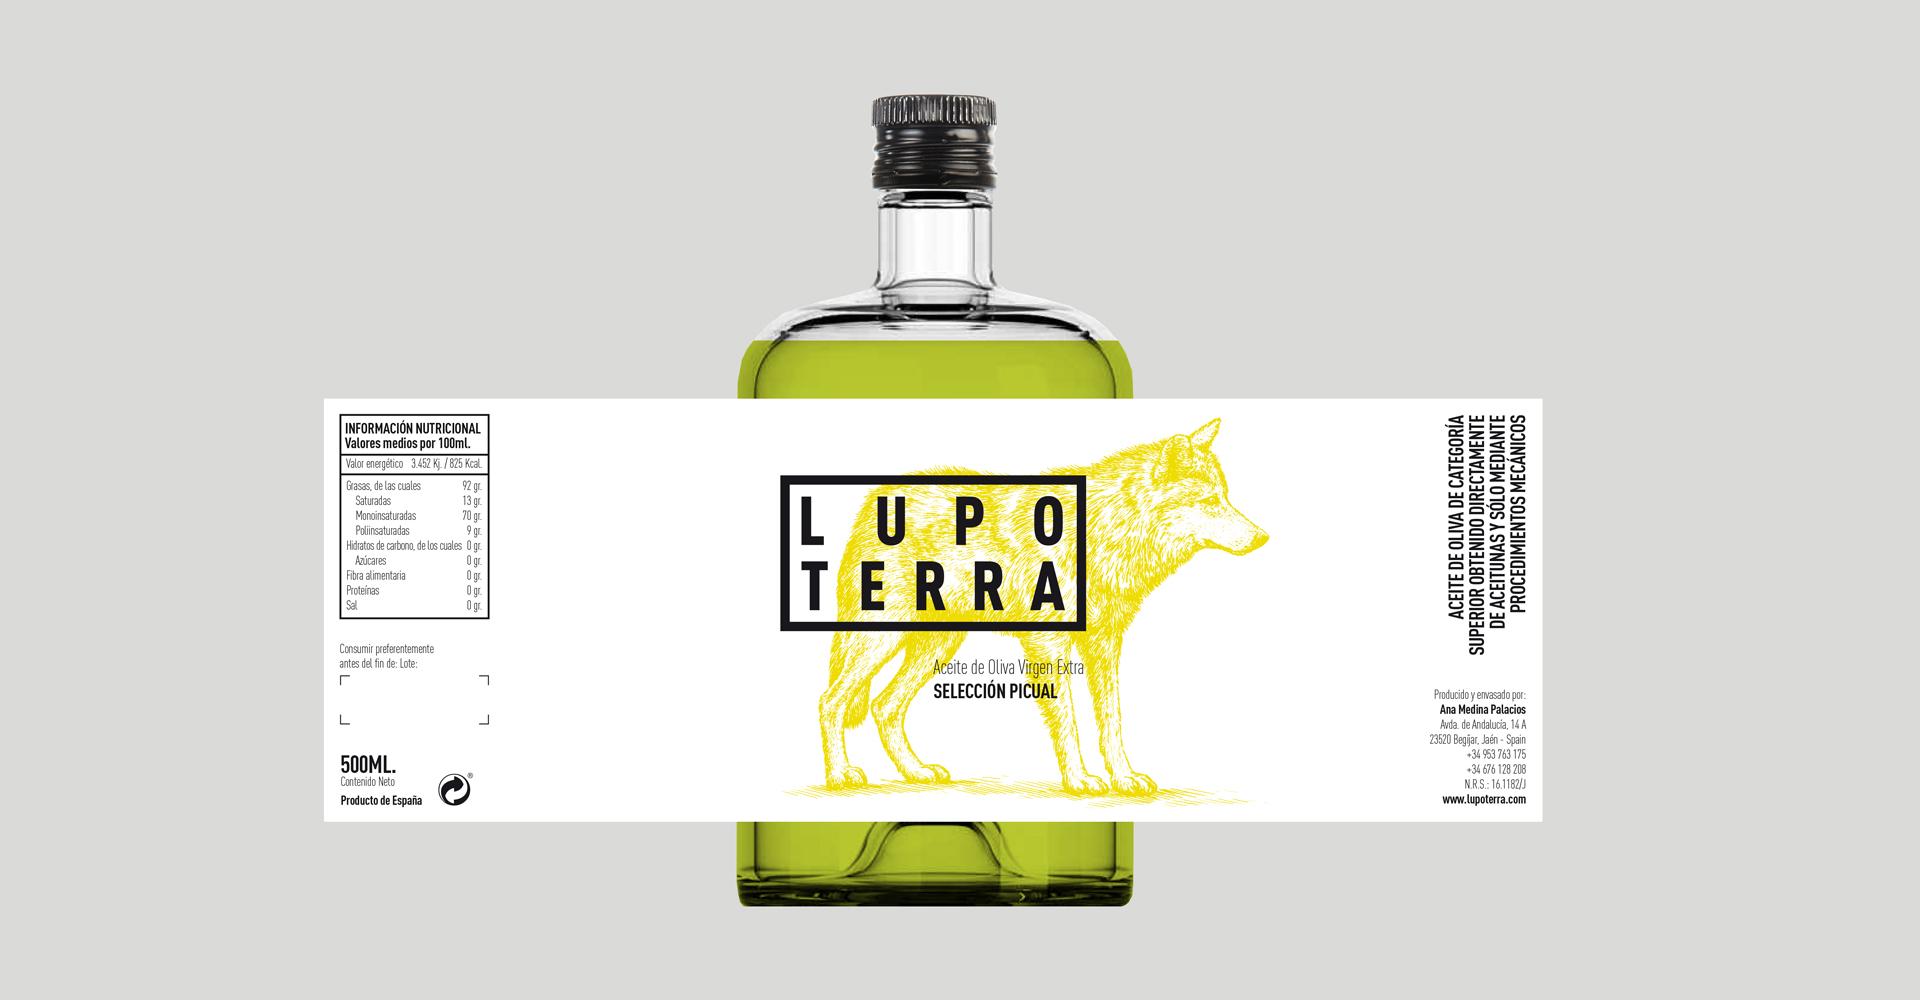 LUPOTERRA aceite de oliva virgen extra